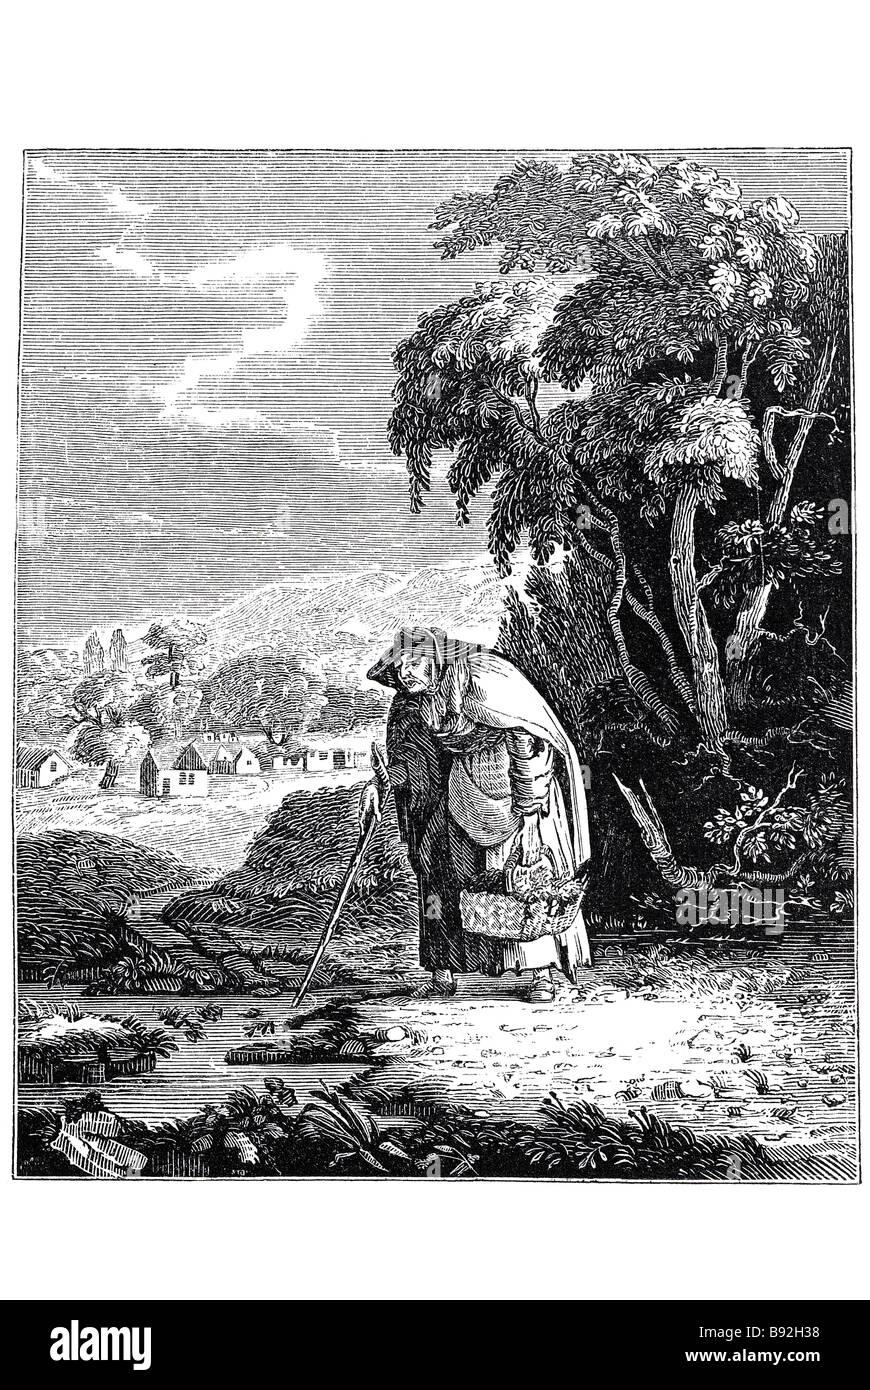 sad historian old man woman walking river stream wood field countryside villiage outside summer shawl basket gathering - Stock Image